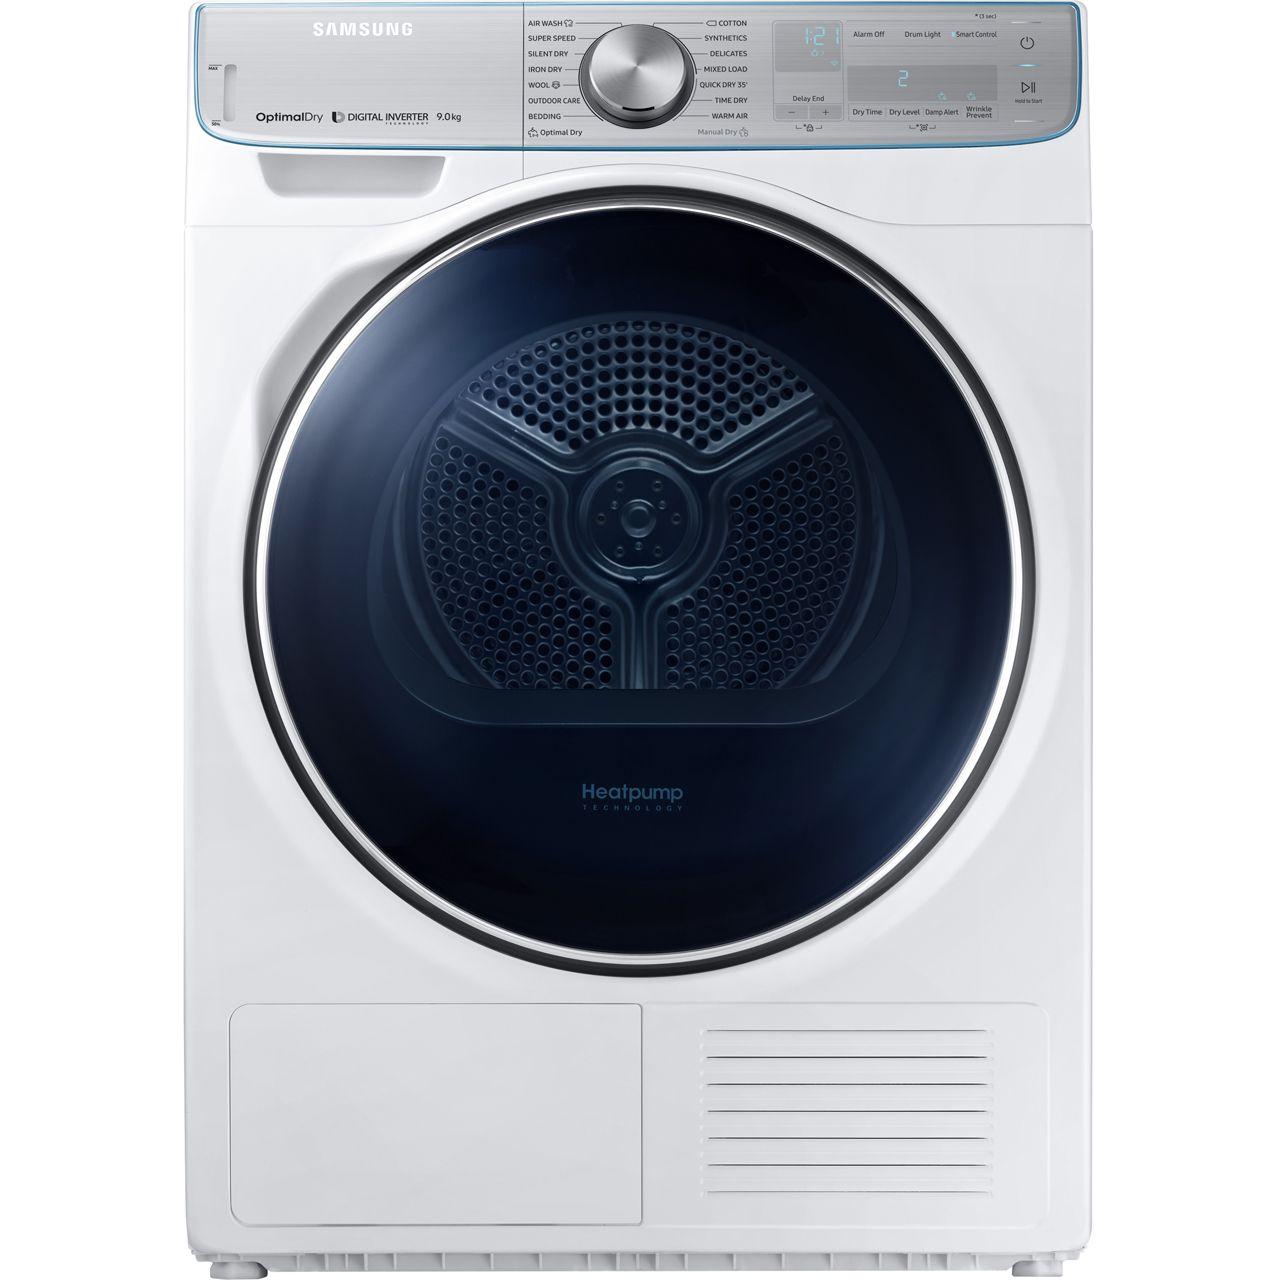 Dv90n8289aw Wh Samsung Heat Pump Tumble Dryer In 2020 Heat Pump Tumble Dryers Clothes Dryer